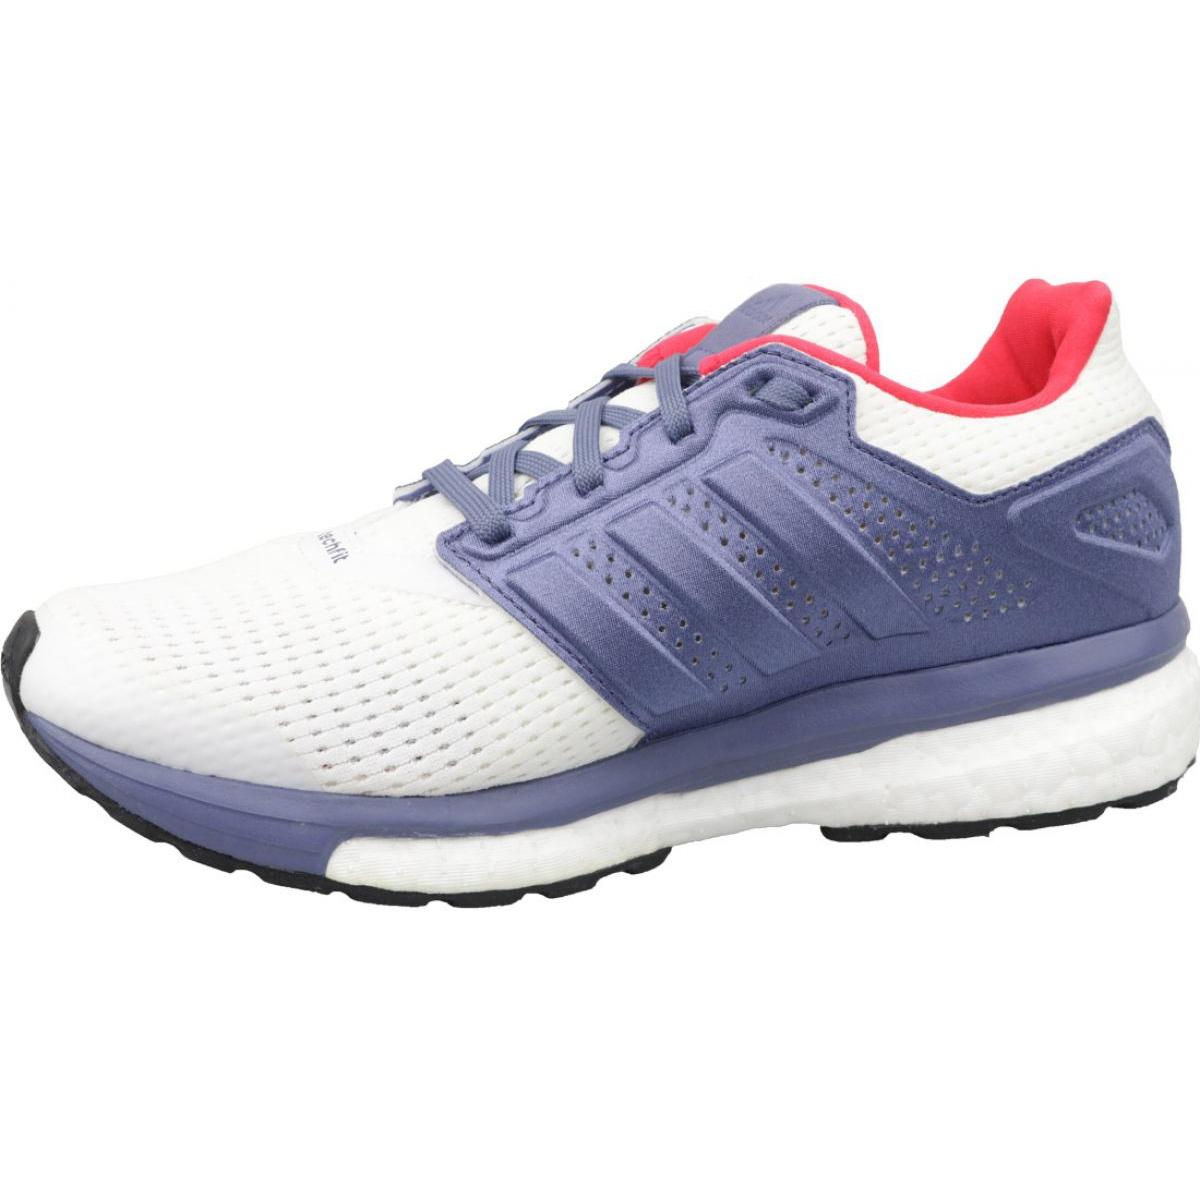 plus récent 08b20 3e945 White Shoes adidas Supernova Glide 8 W S80277